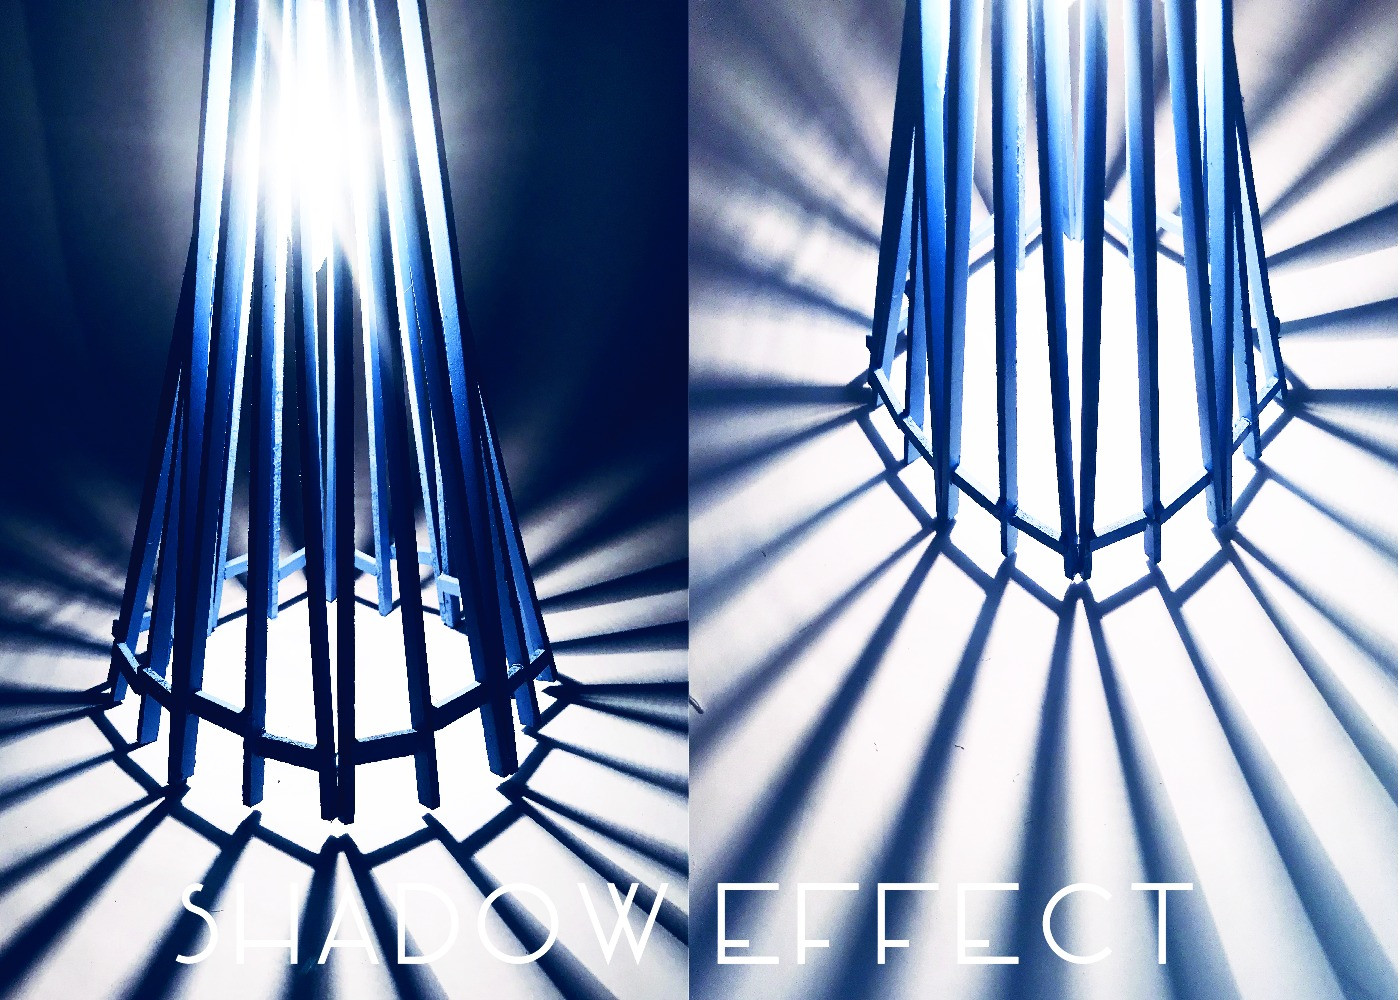 Fence Light Shadow Effect